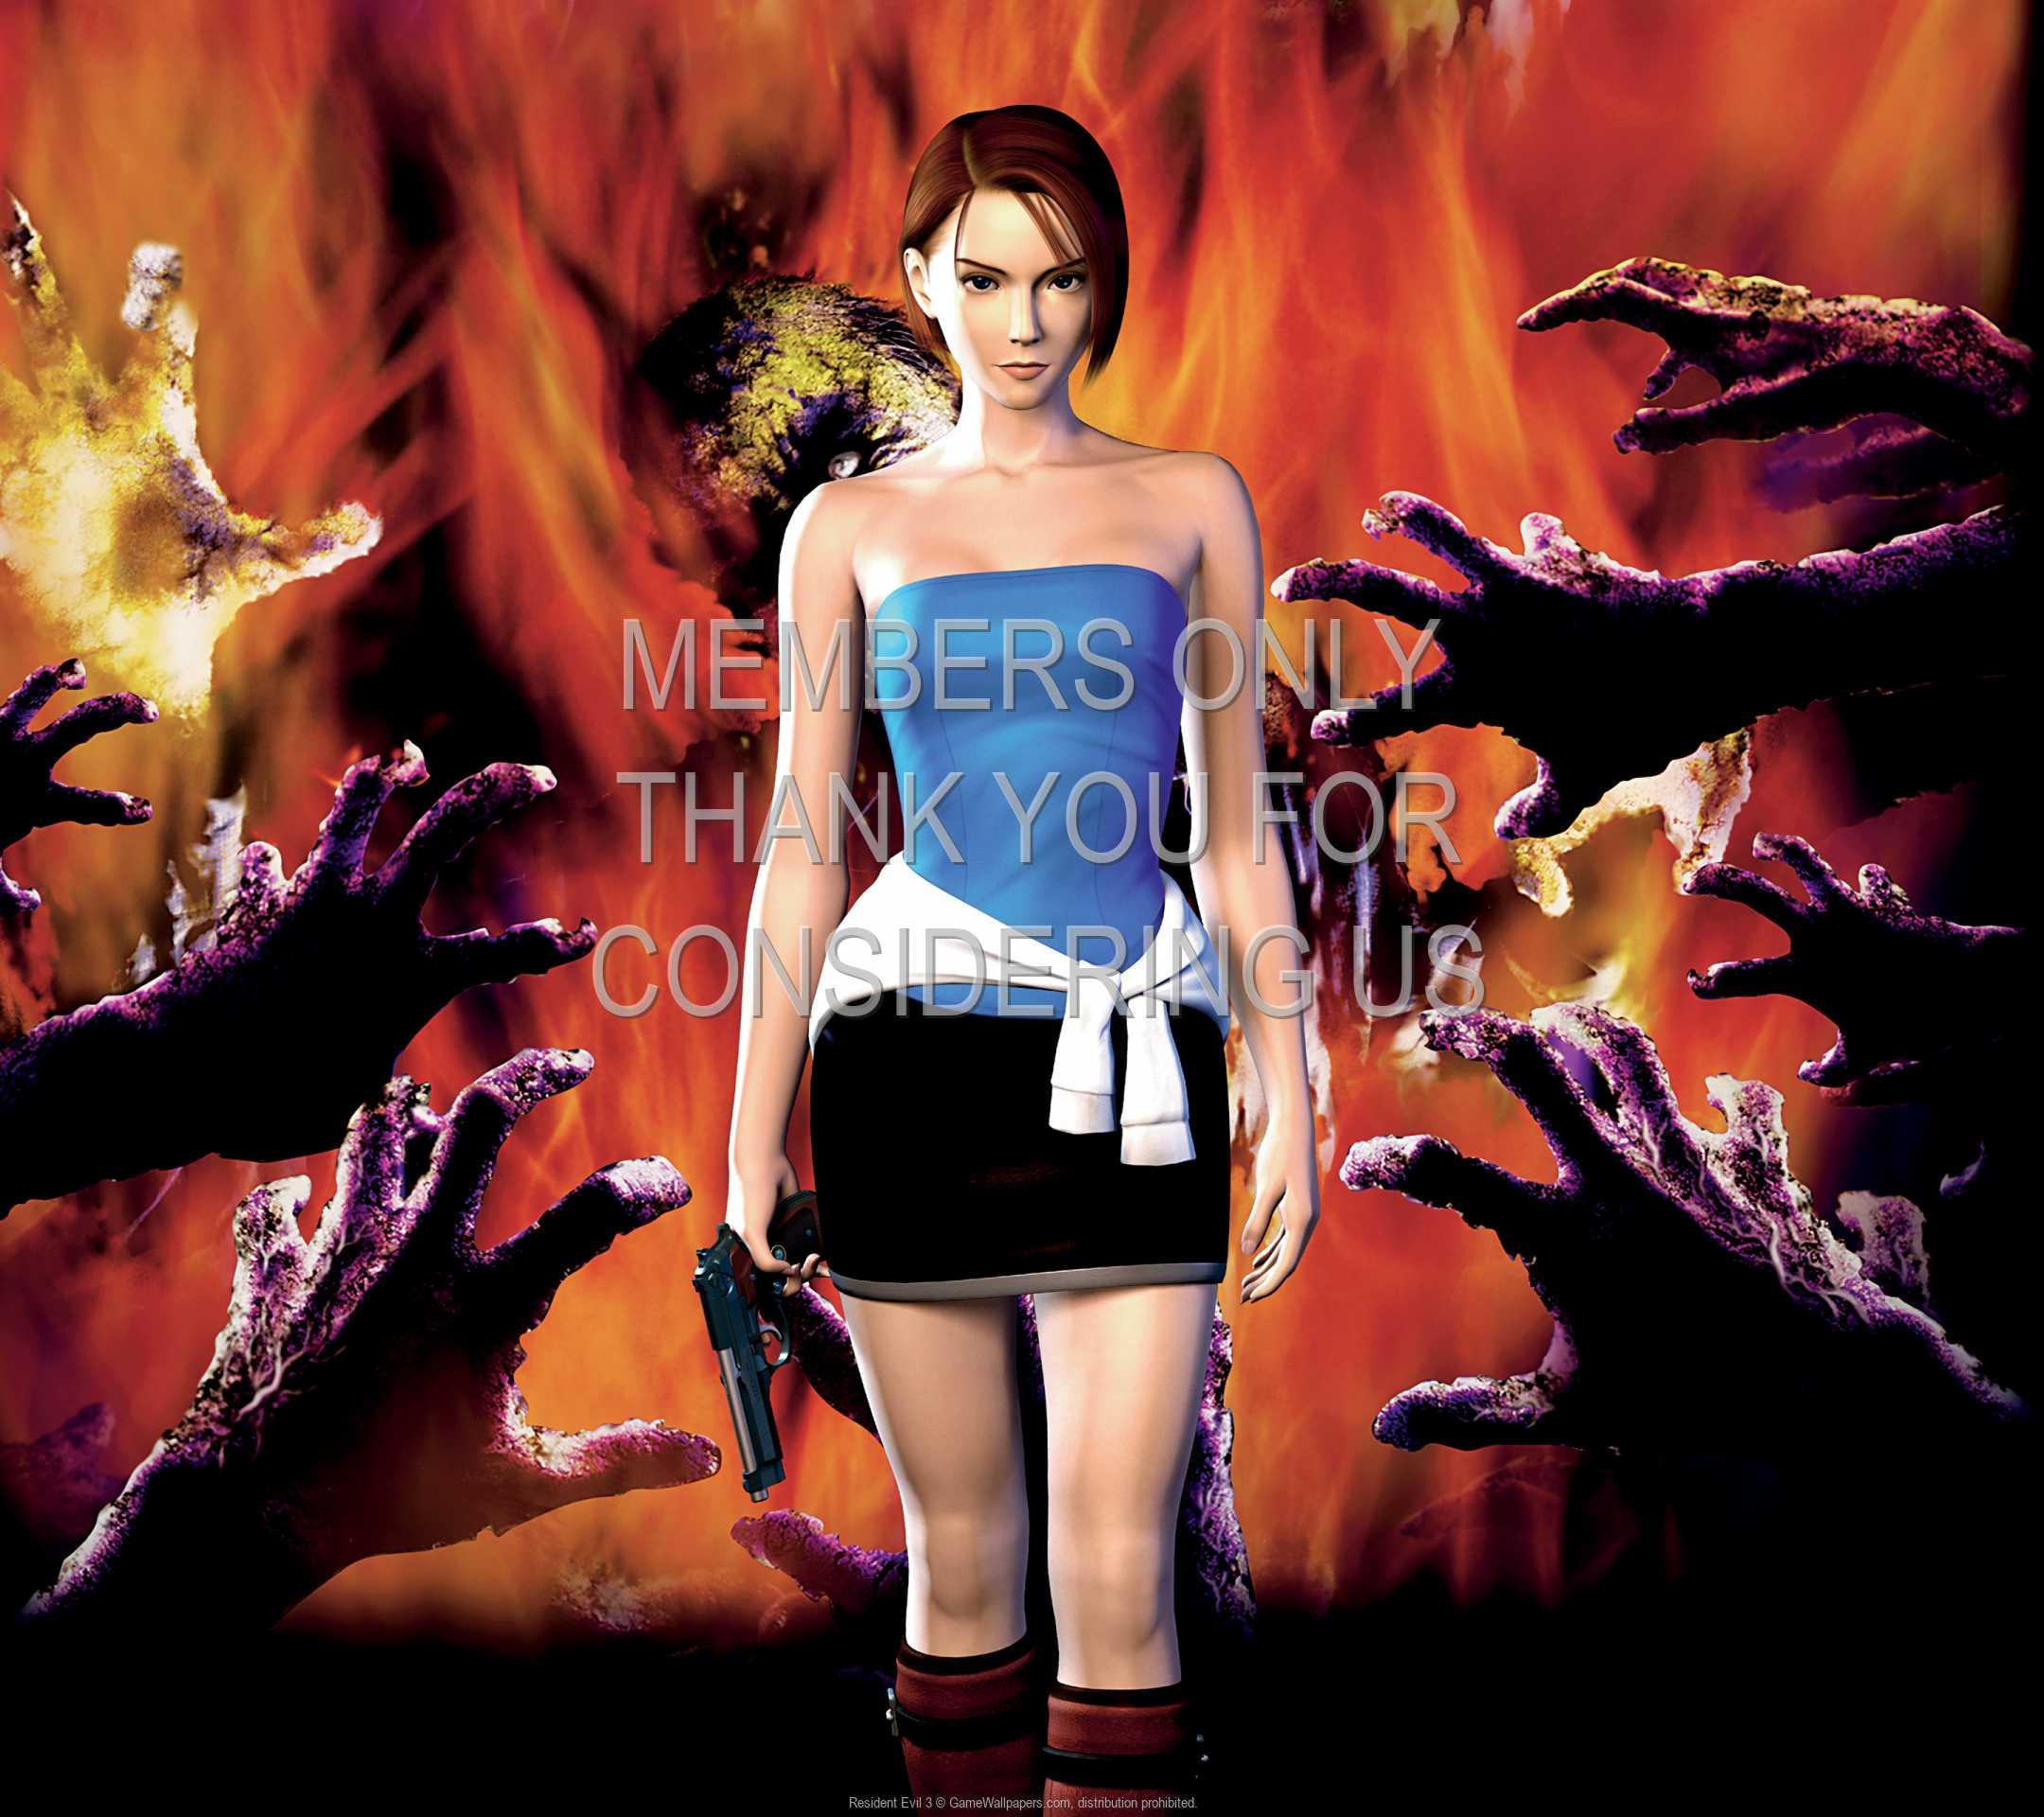 Resident Evil 3 1080p Horizontal Mobile fond d'écran 06